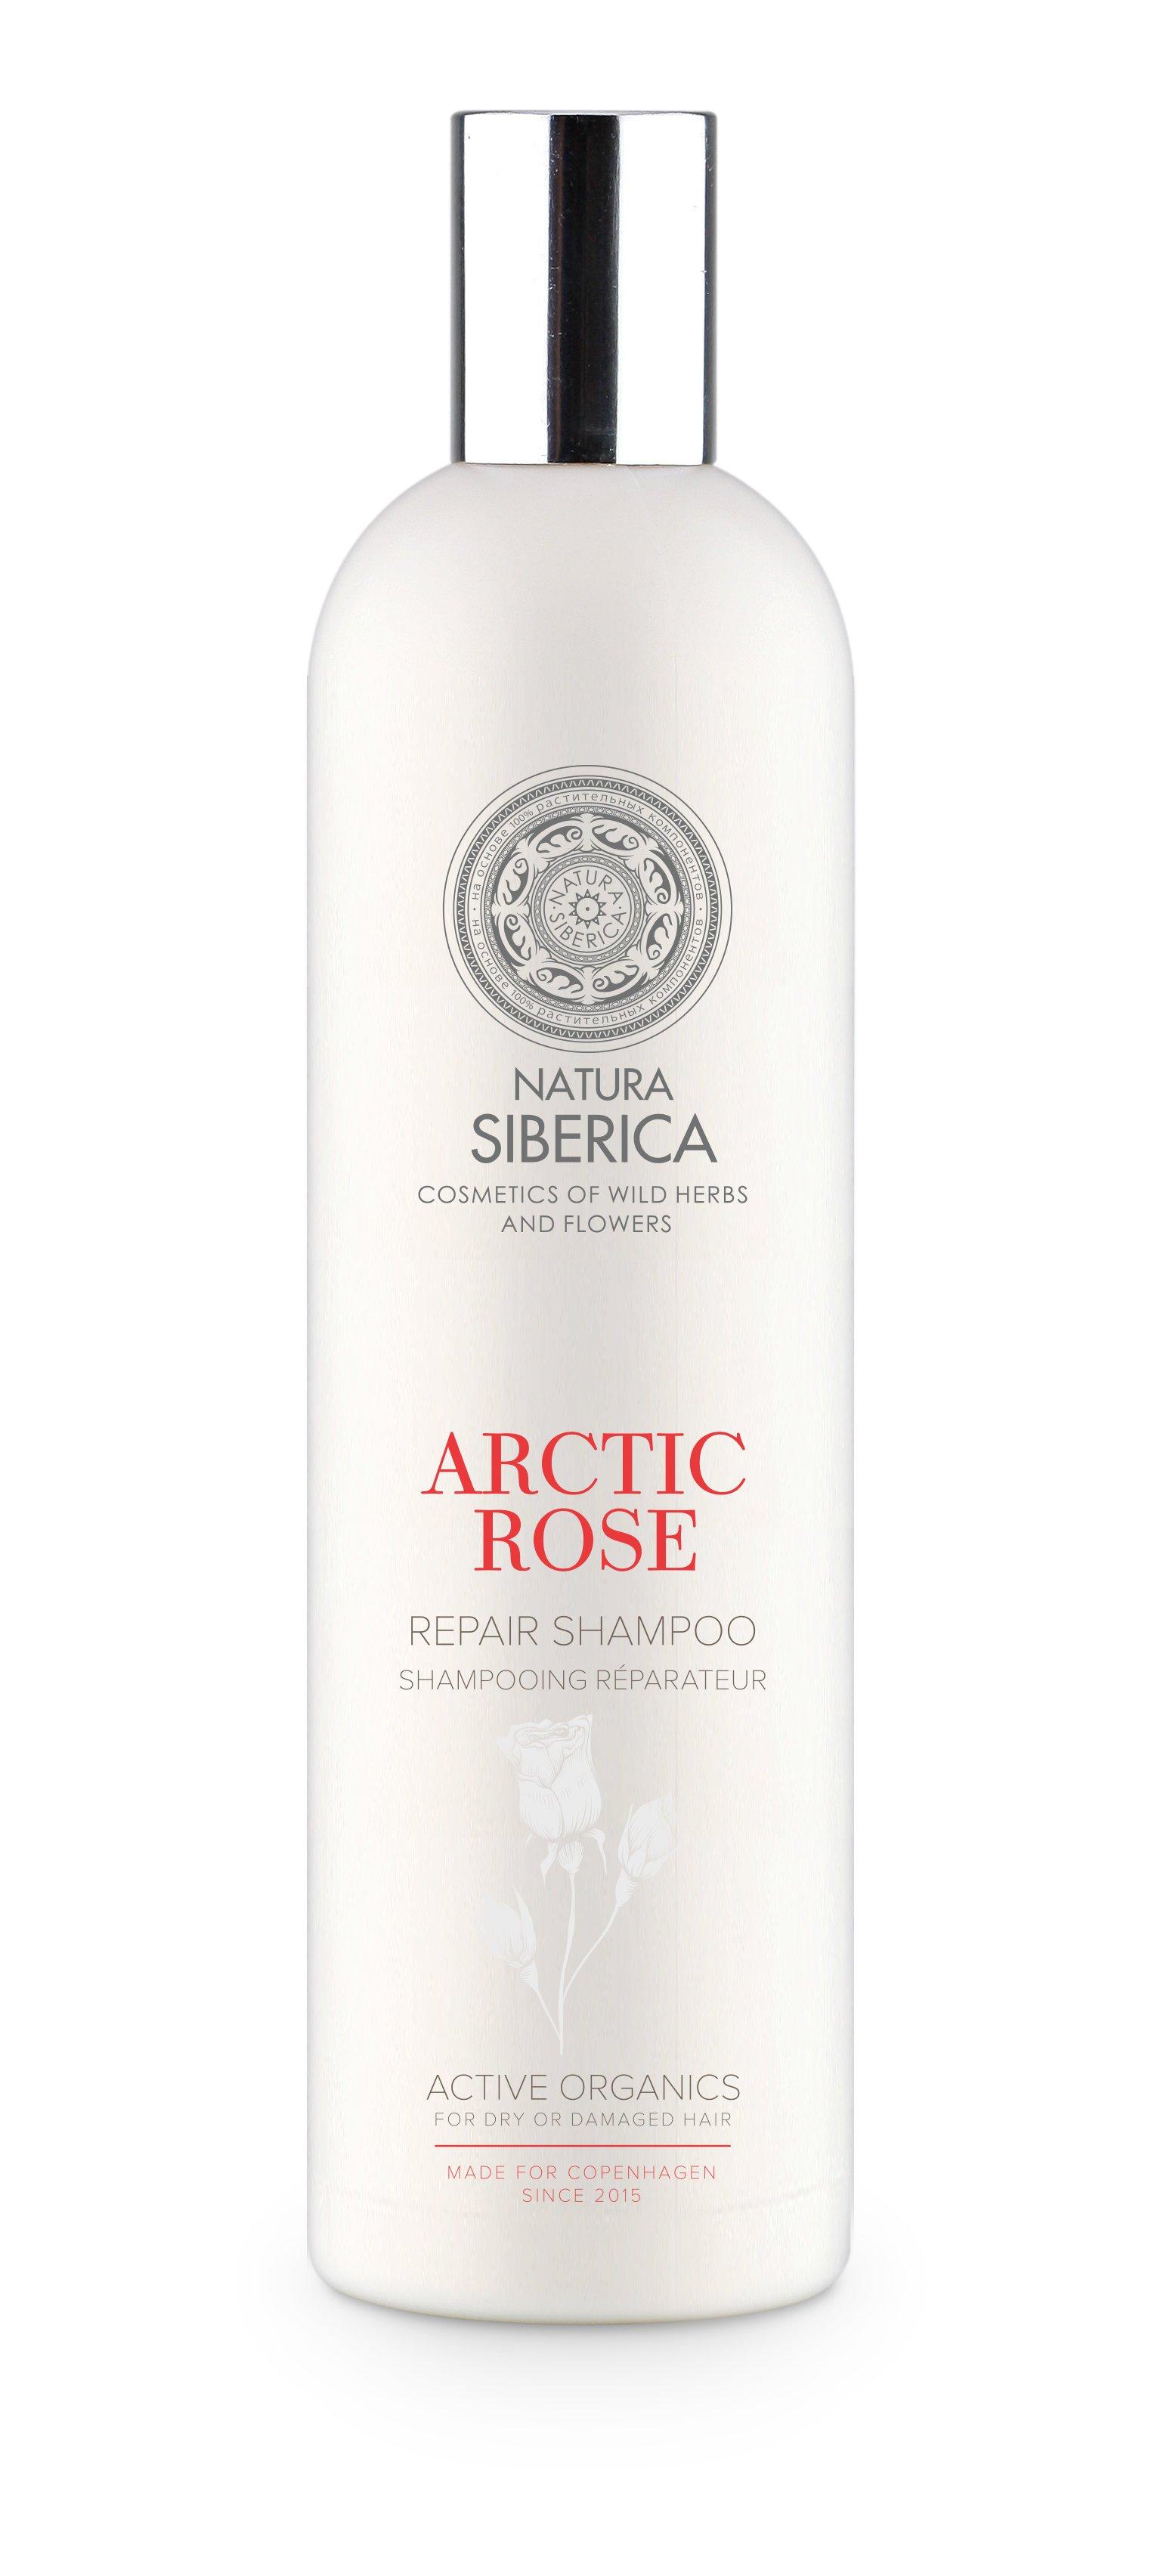 Atstatantis plaukų šampūnas Natura Siberica Copenhagen 400 ml